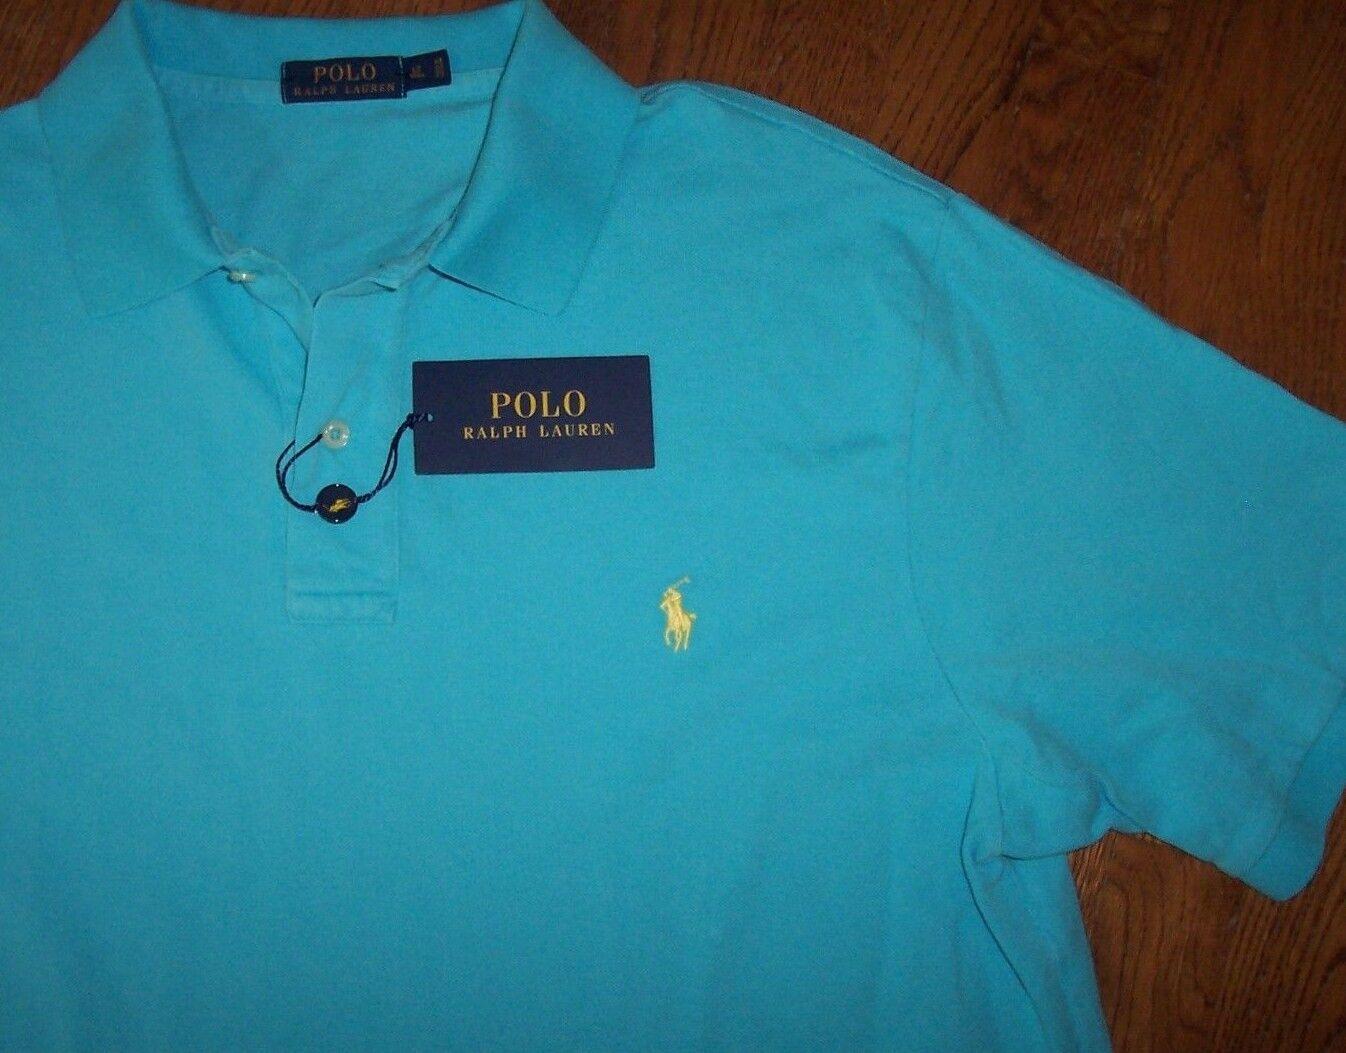 NWT Polo Ralph Lauren TRUE AQUA bluee Mesh Knit Shirt Men's XLT Tall Yellow Pony